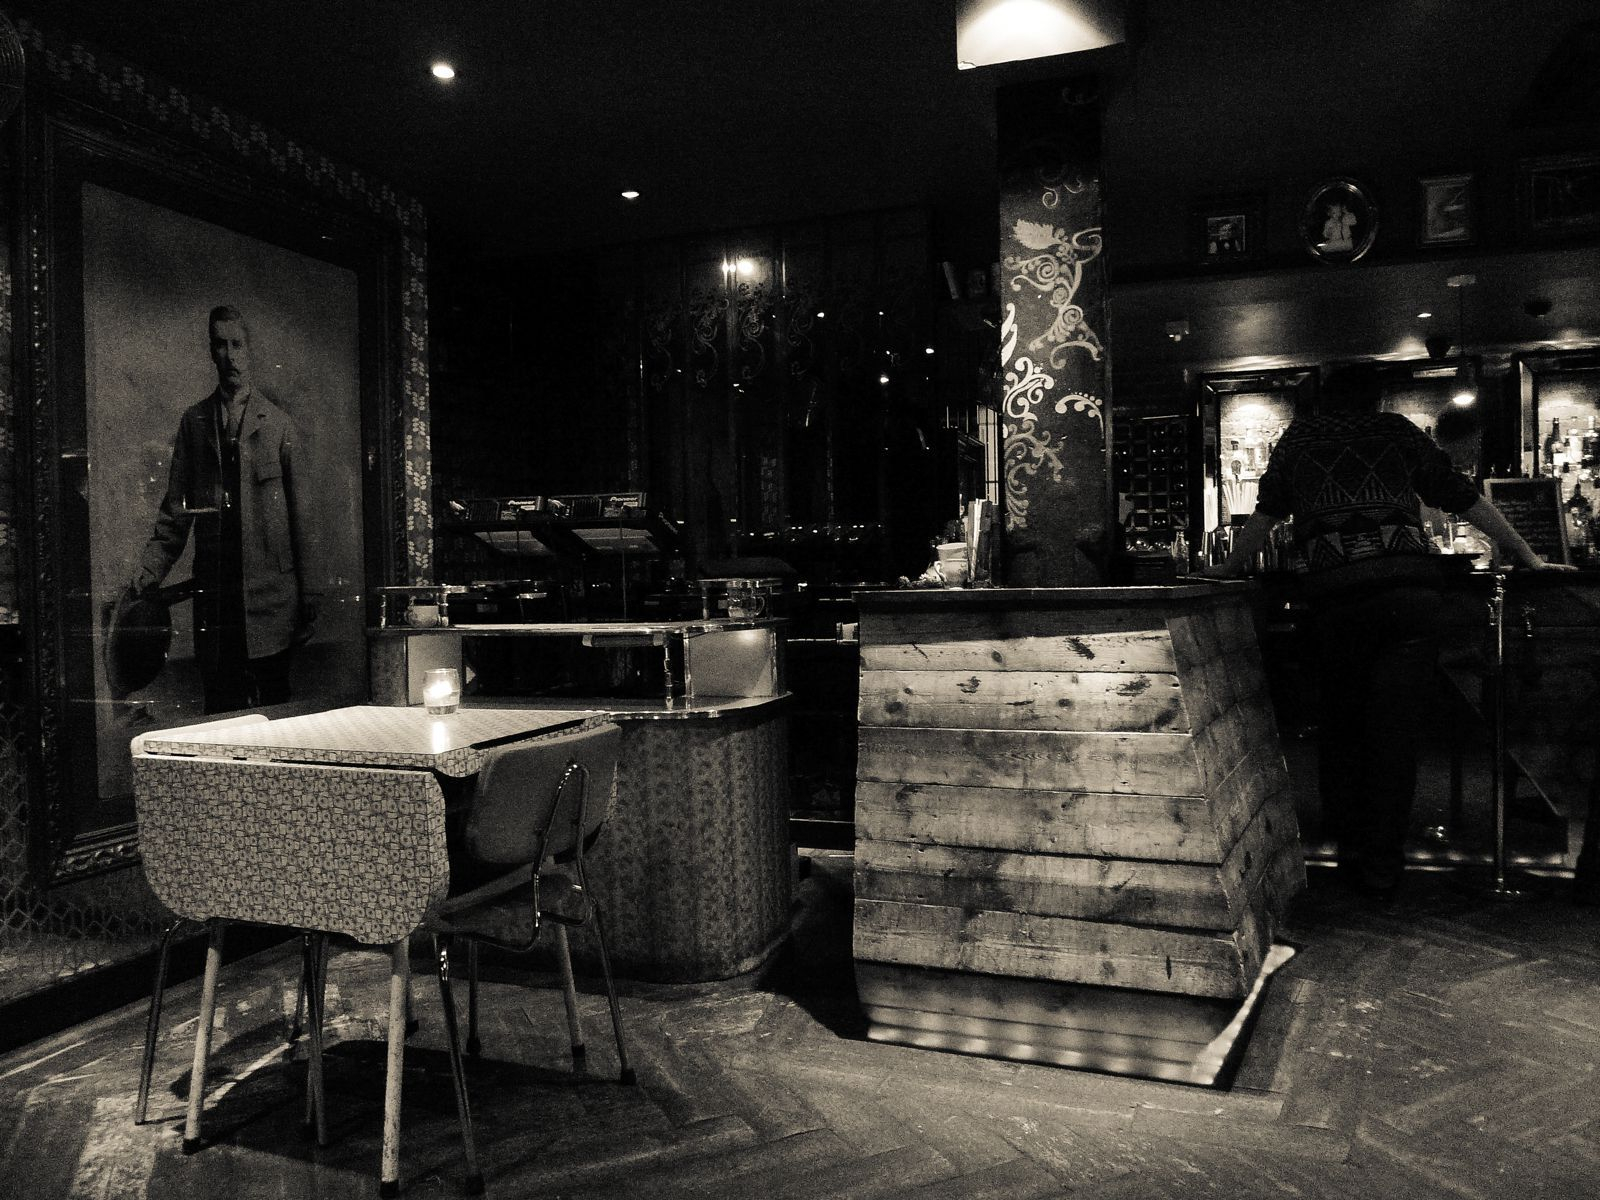 10 Best Bars In Shoreditch - London | Bars in shoreditch ...